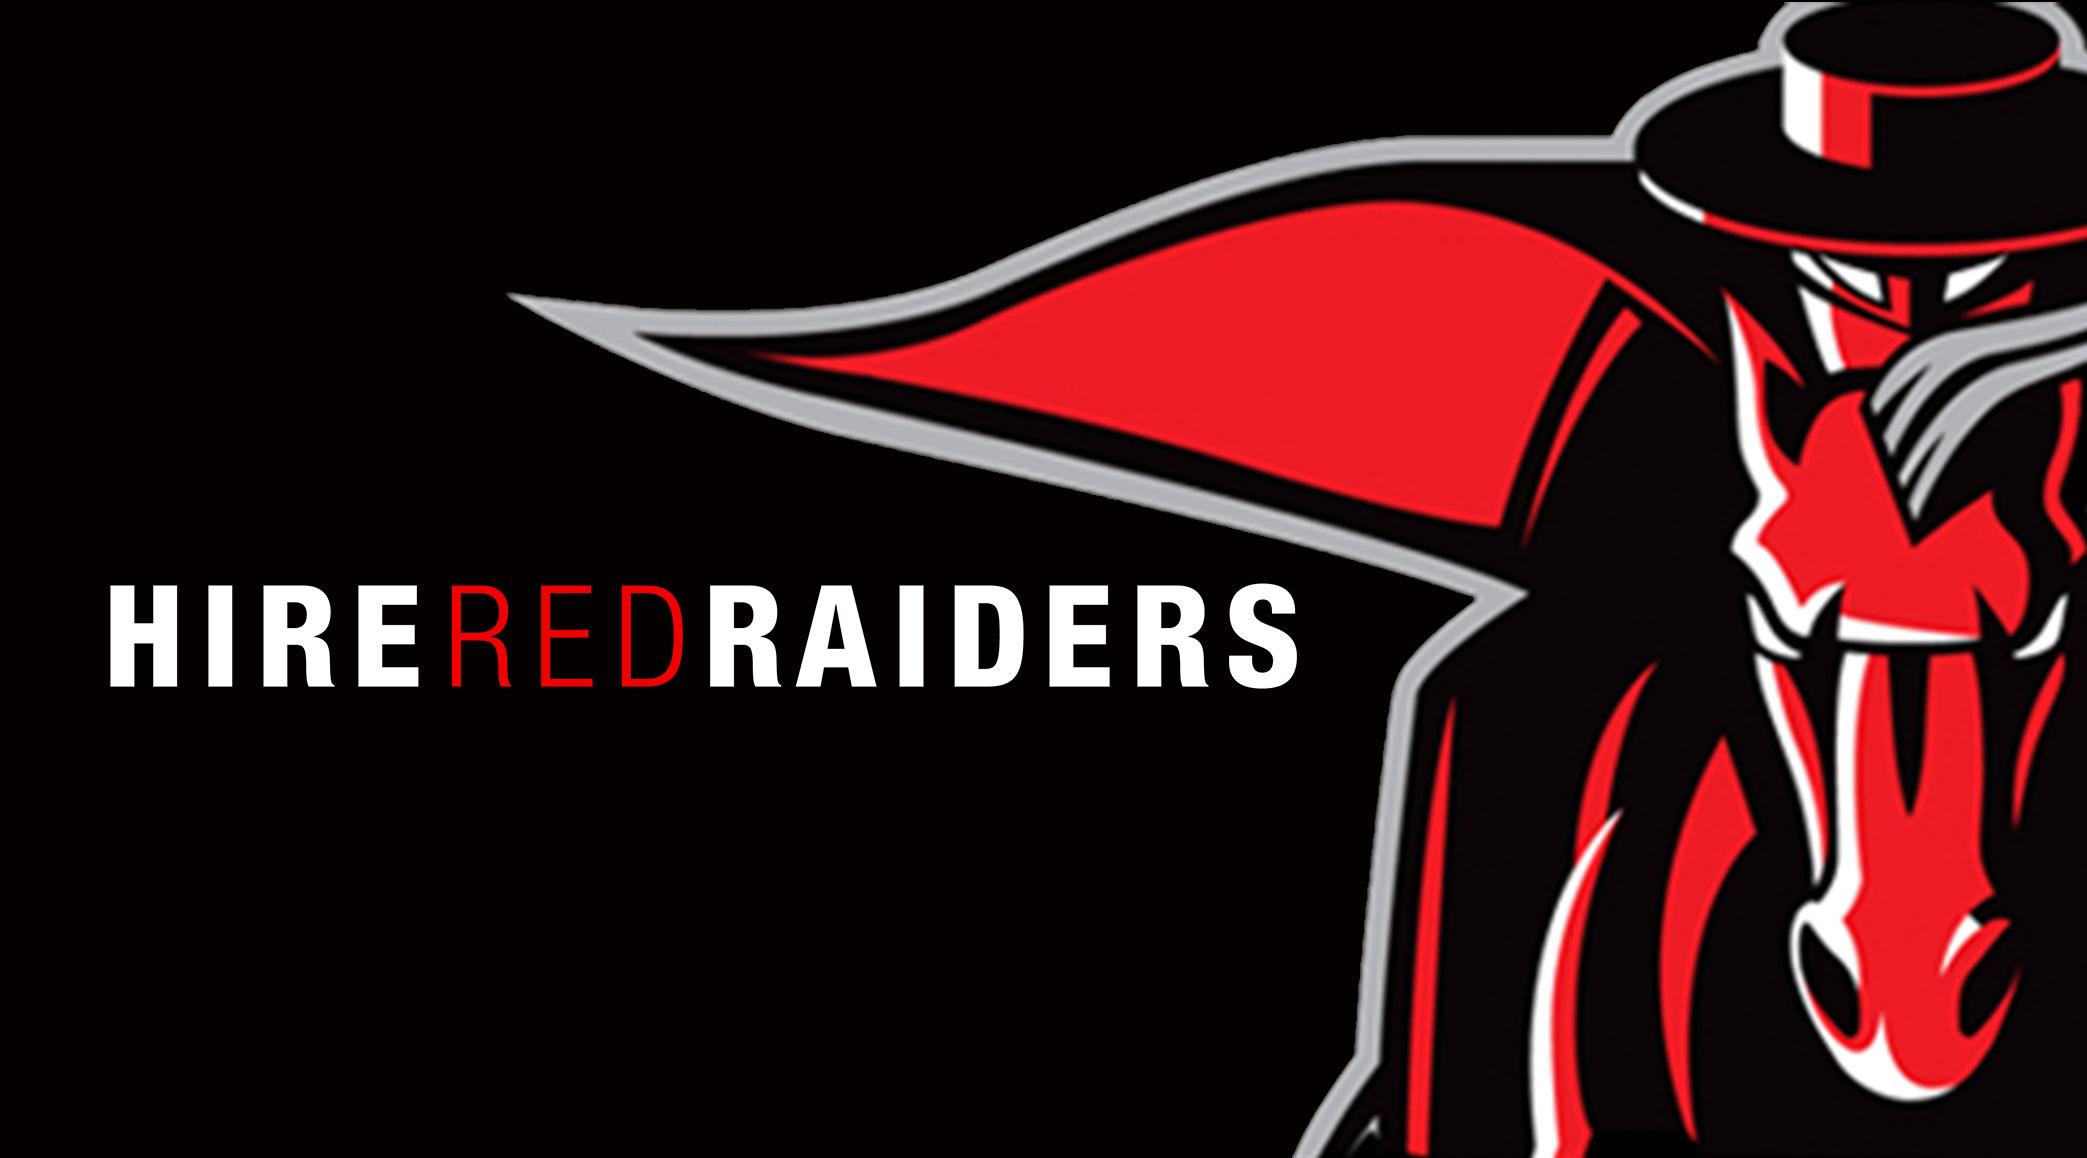 Hire Red Raiders University Career Center TTU